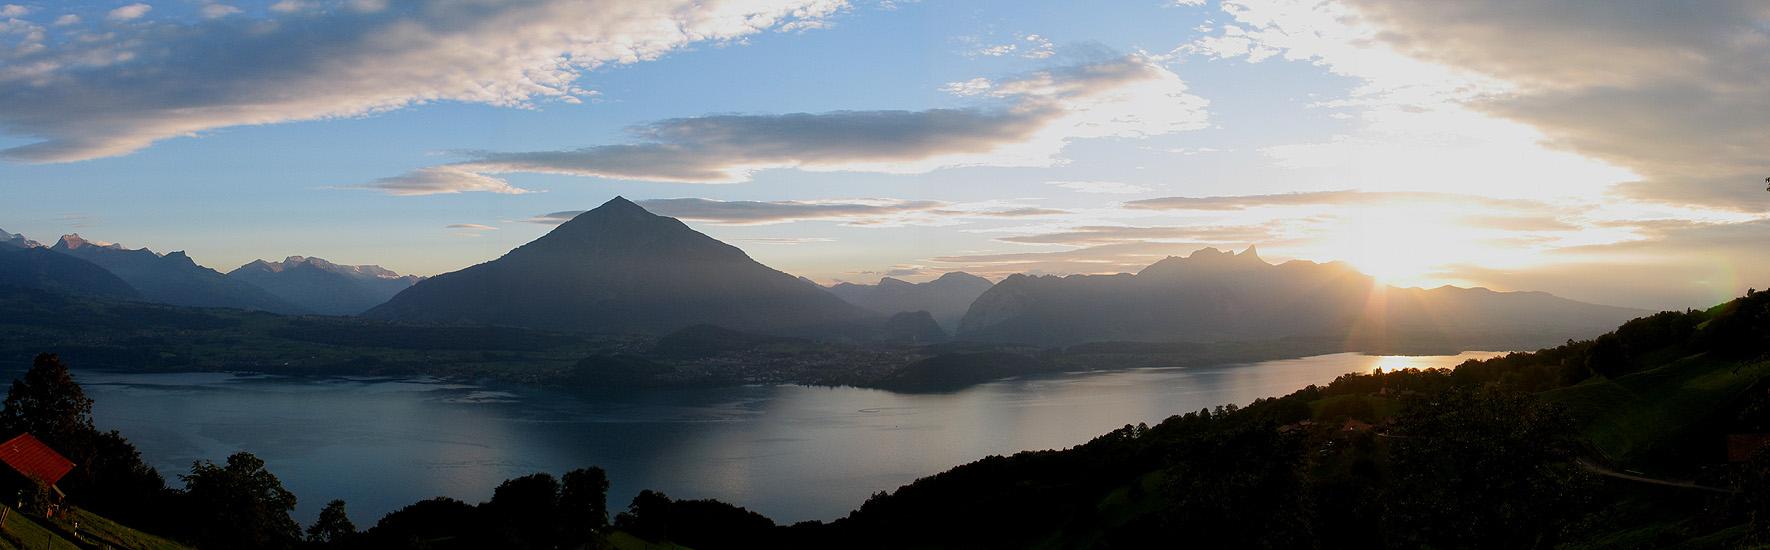 The spectacular Region of Beatenberg (Berner Oberland, Switzerland ... Railway